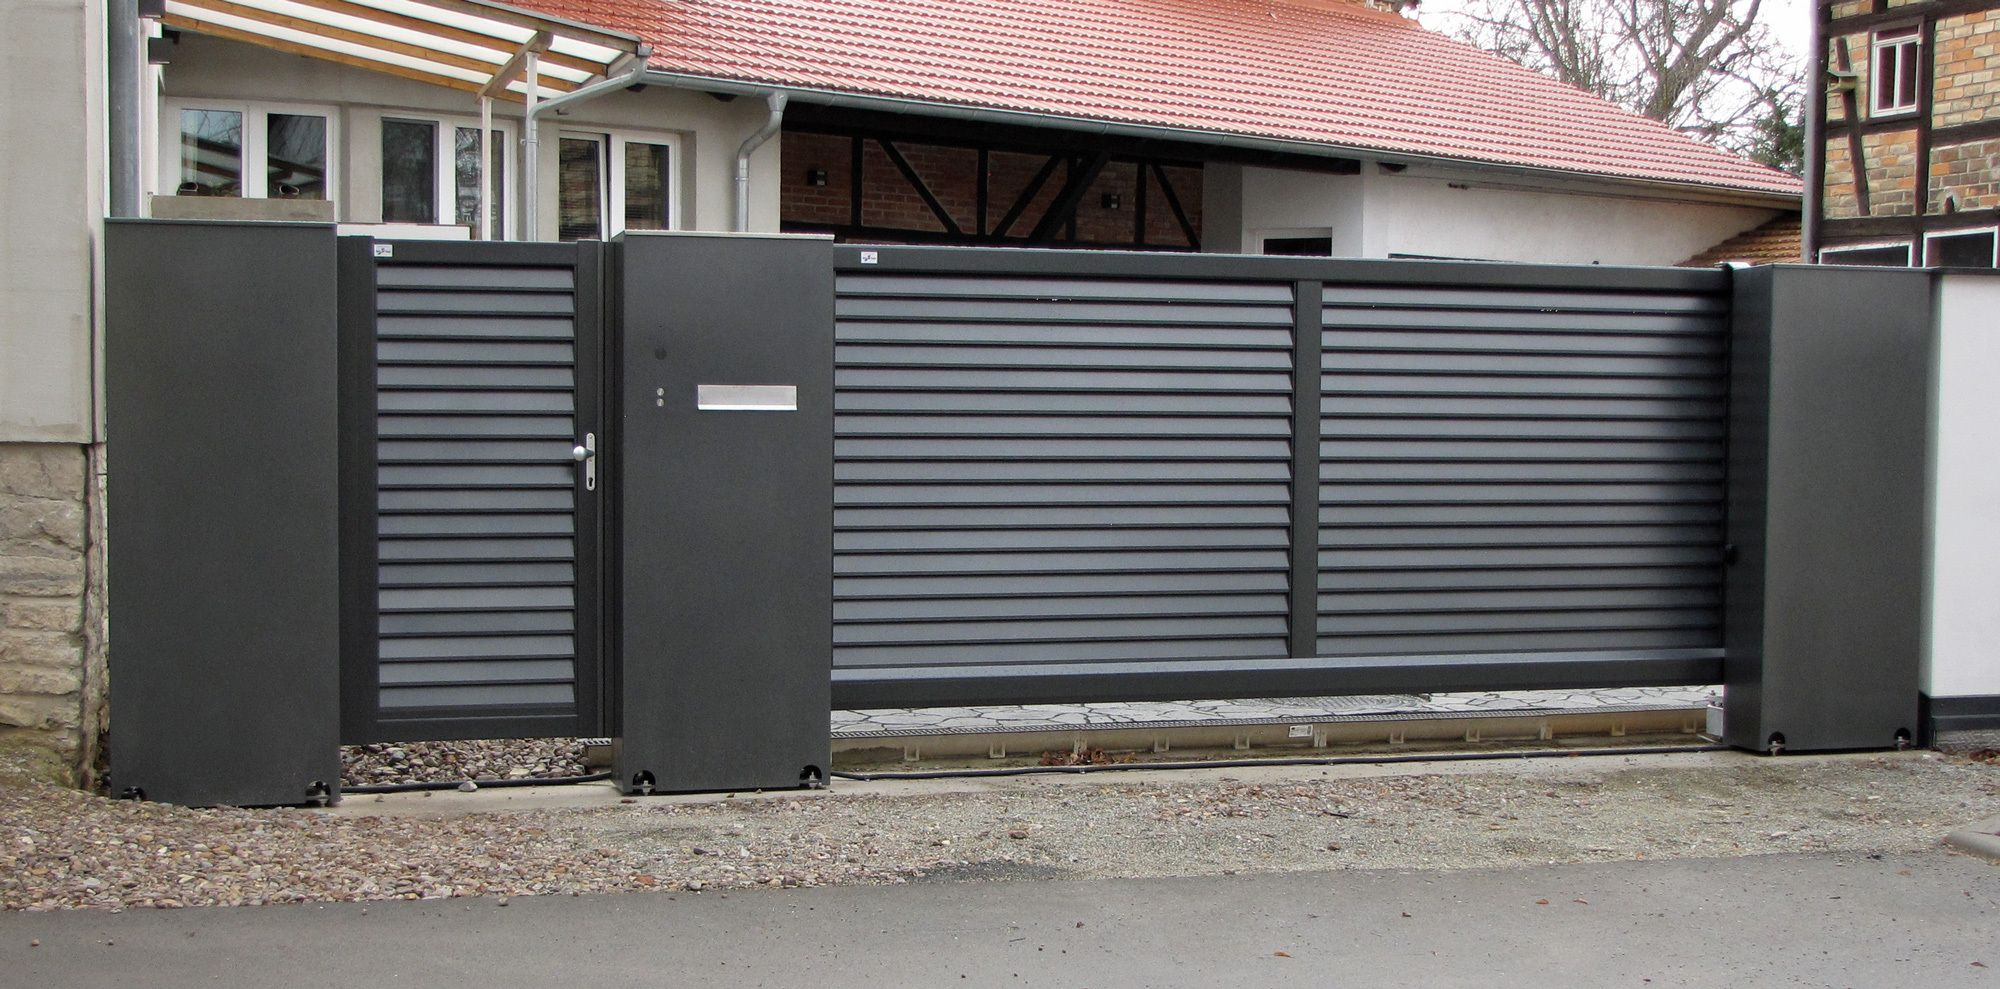 Schiebetor Mit Lamellenfullung House Gate Design Door Gate